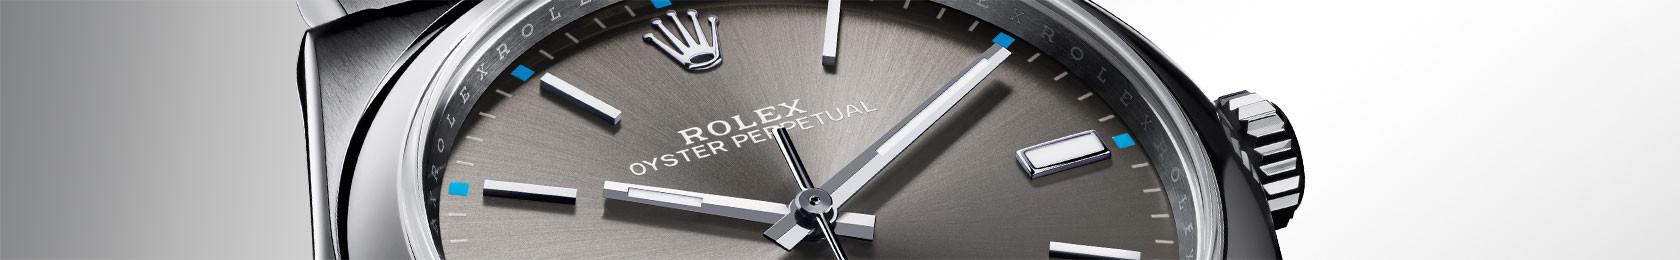 Rolex Oyster-Perpetual Zifferblatt